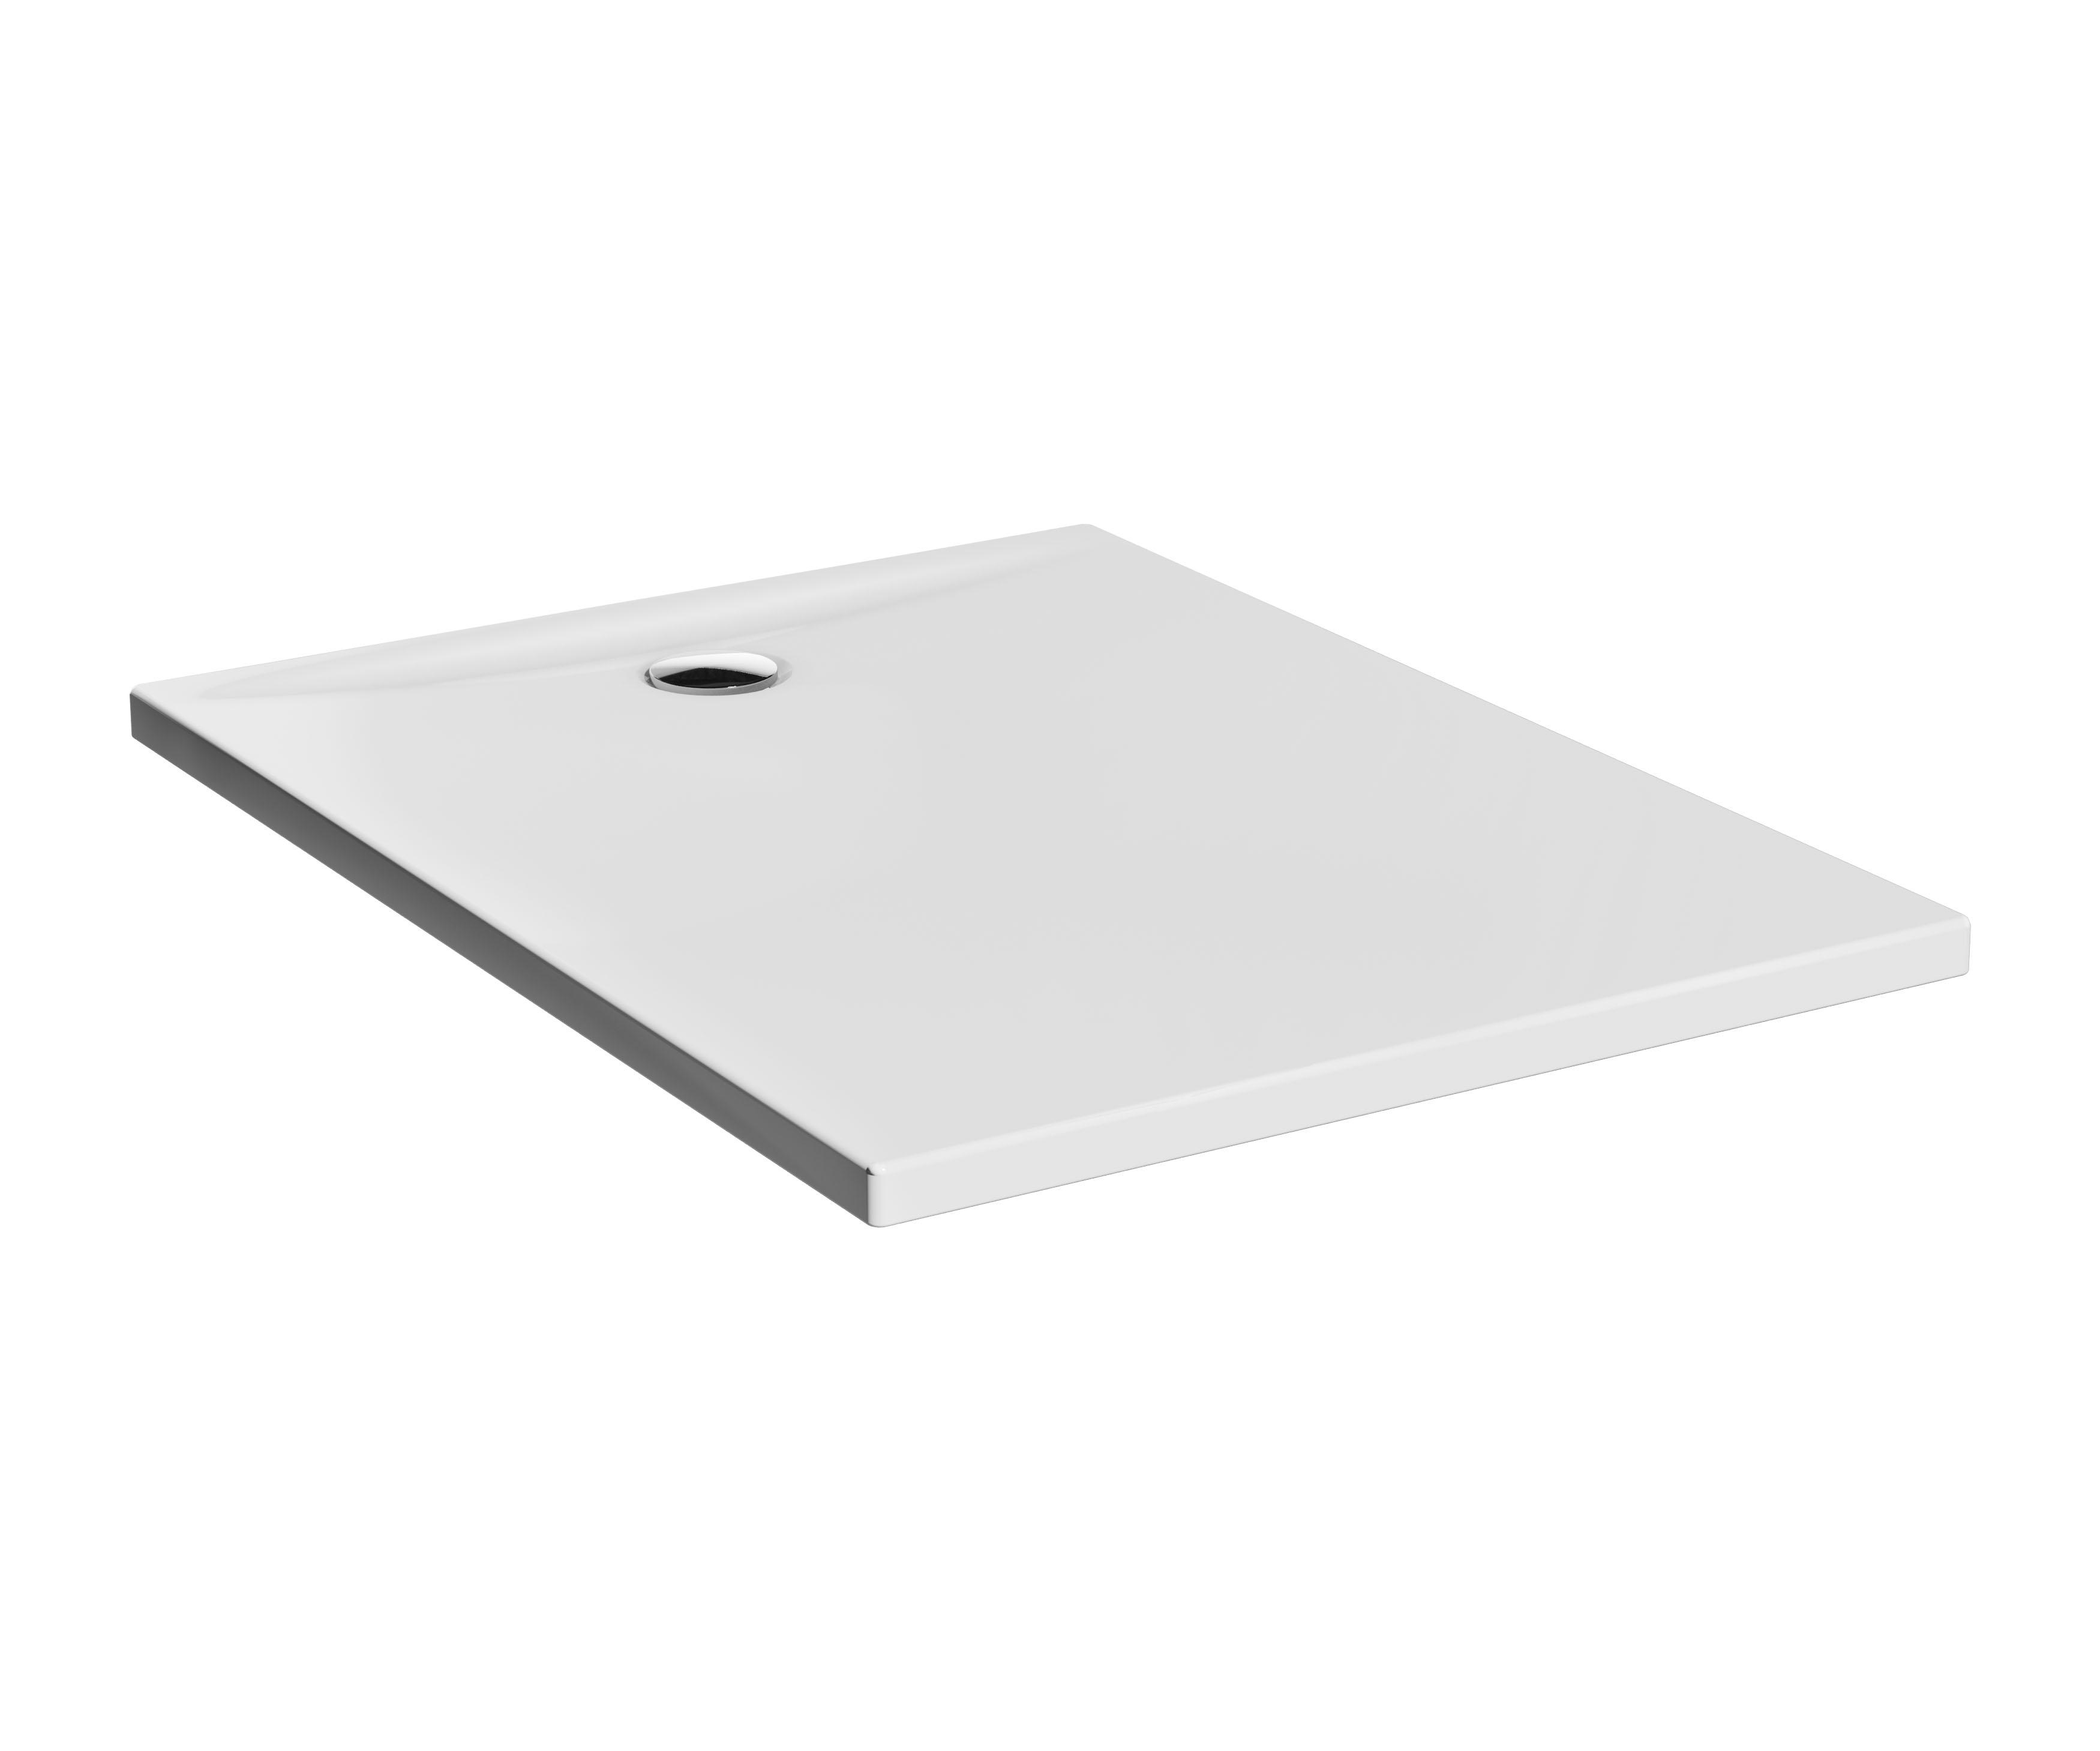 Lagoon receveur ultra plat en céramique, 120  x  90 cm, blanc